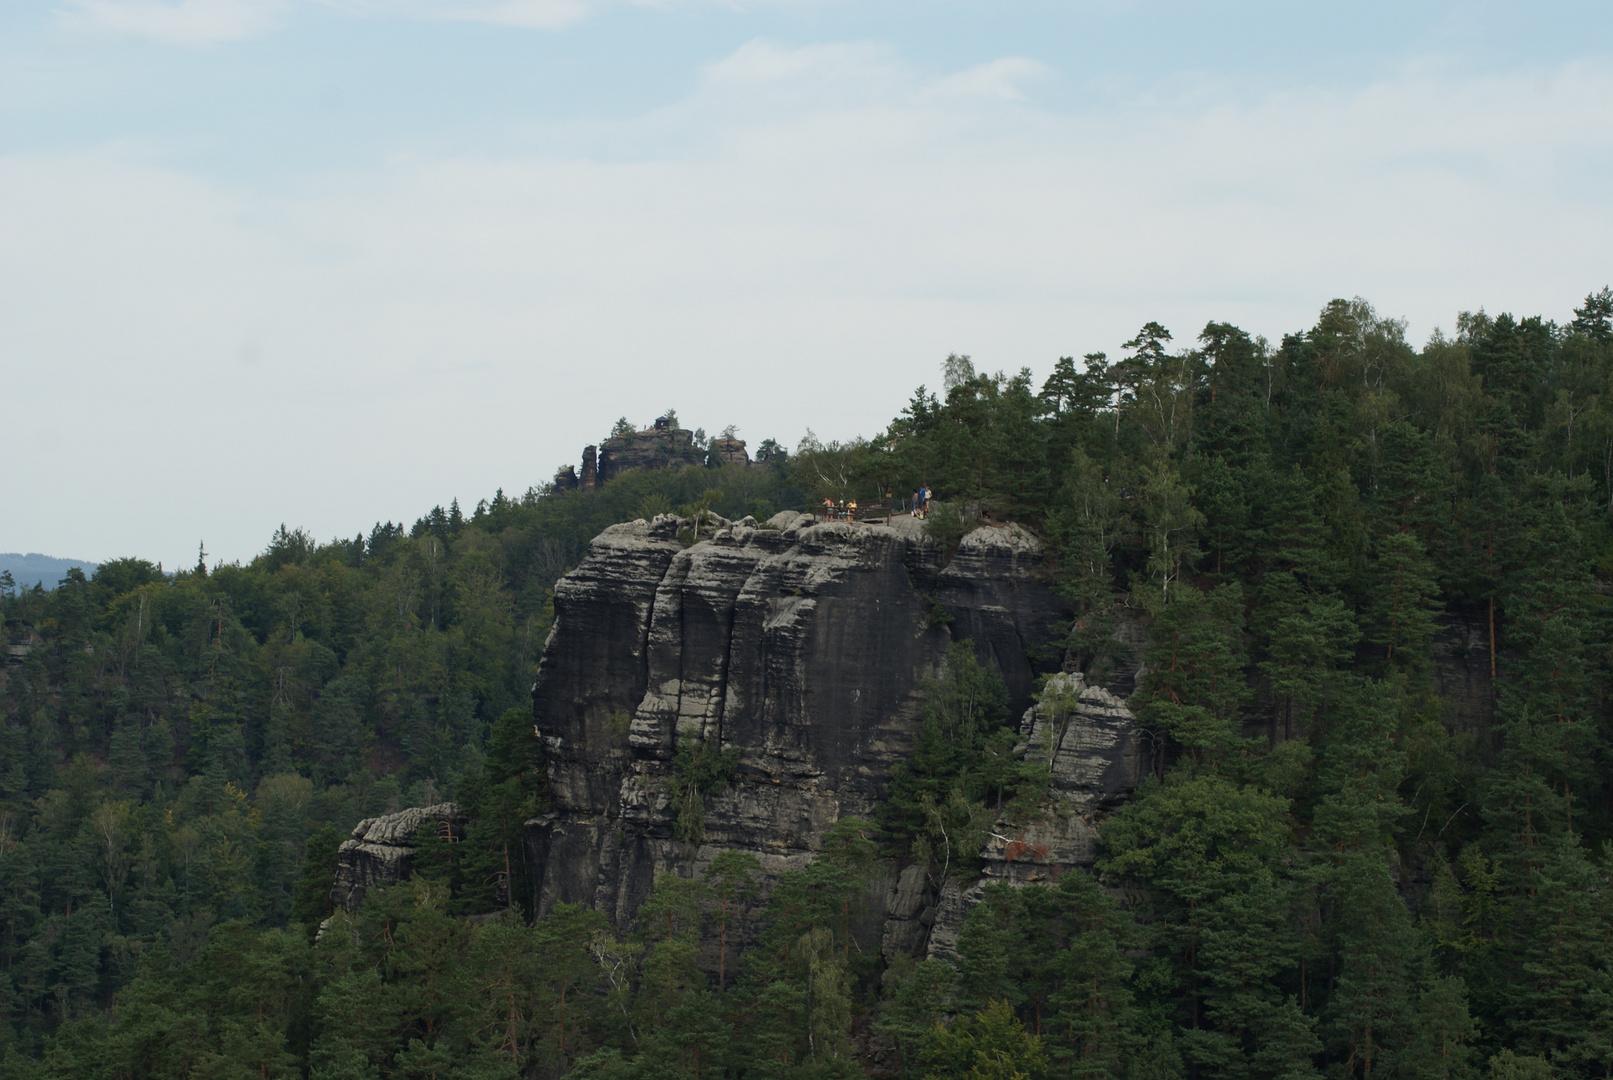 Dittersbacher Felsenwelt (2)